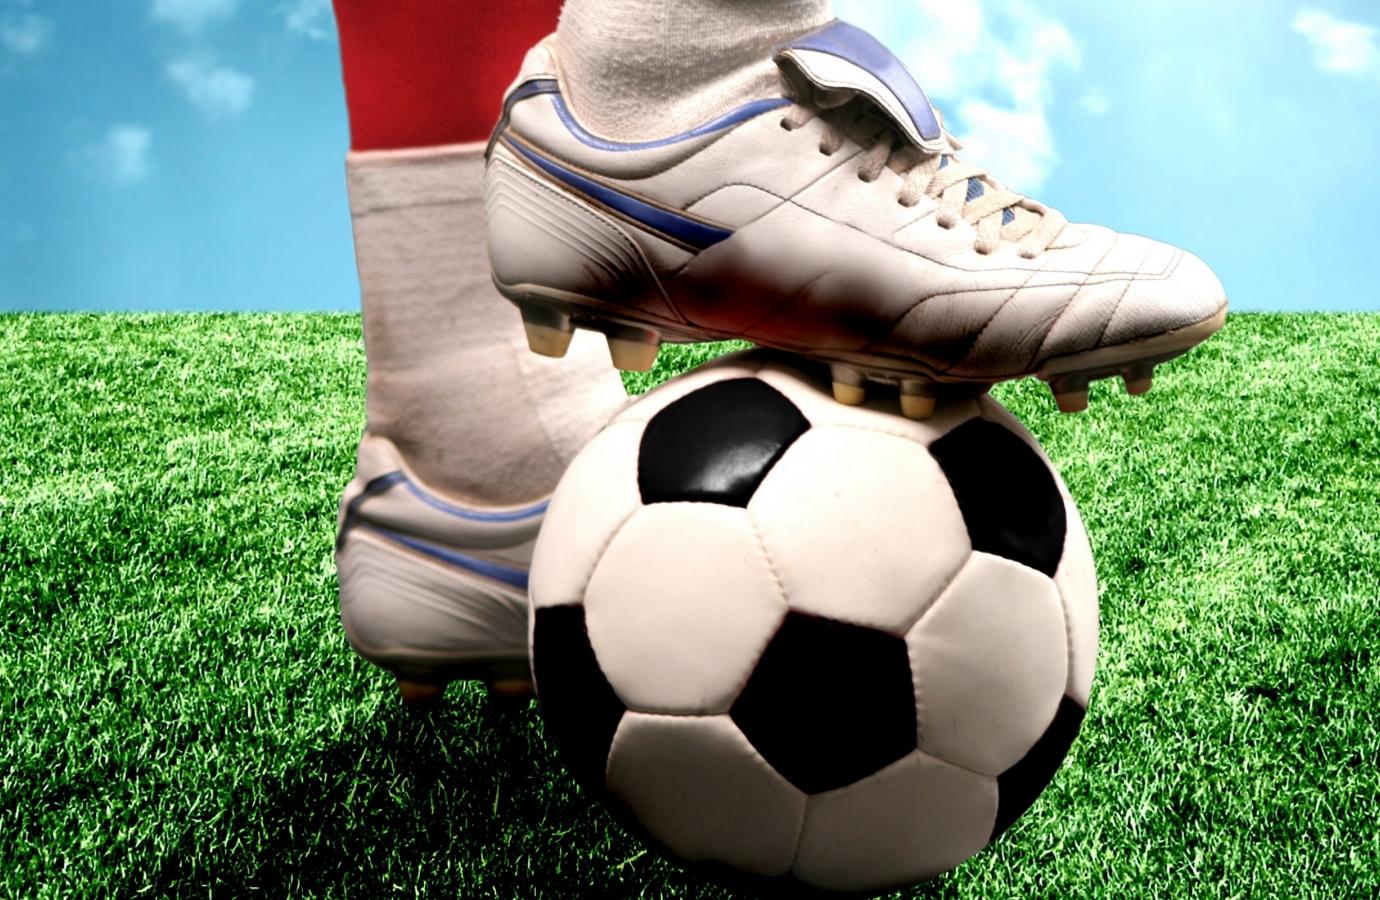 Pemain sepakbola profesional